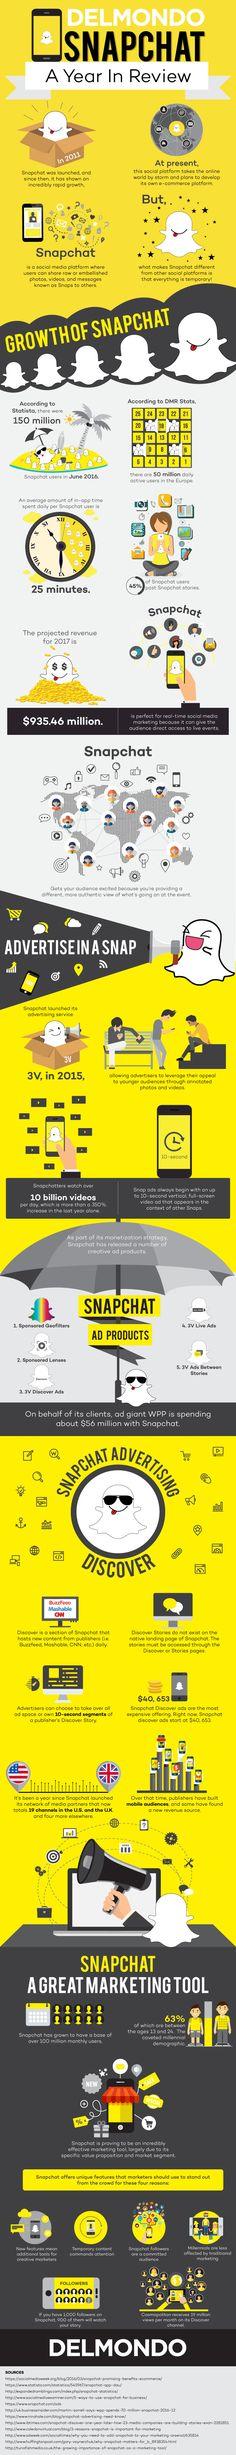 Snapchat groei cijfers